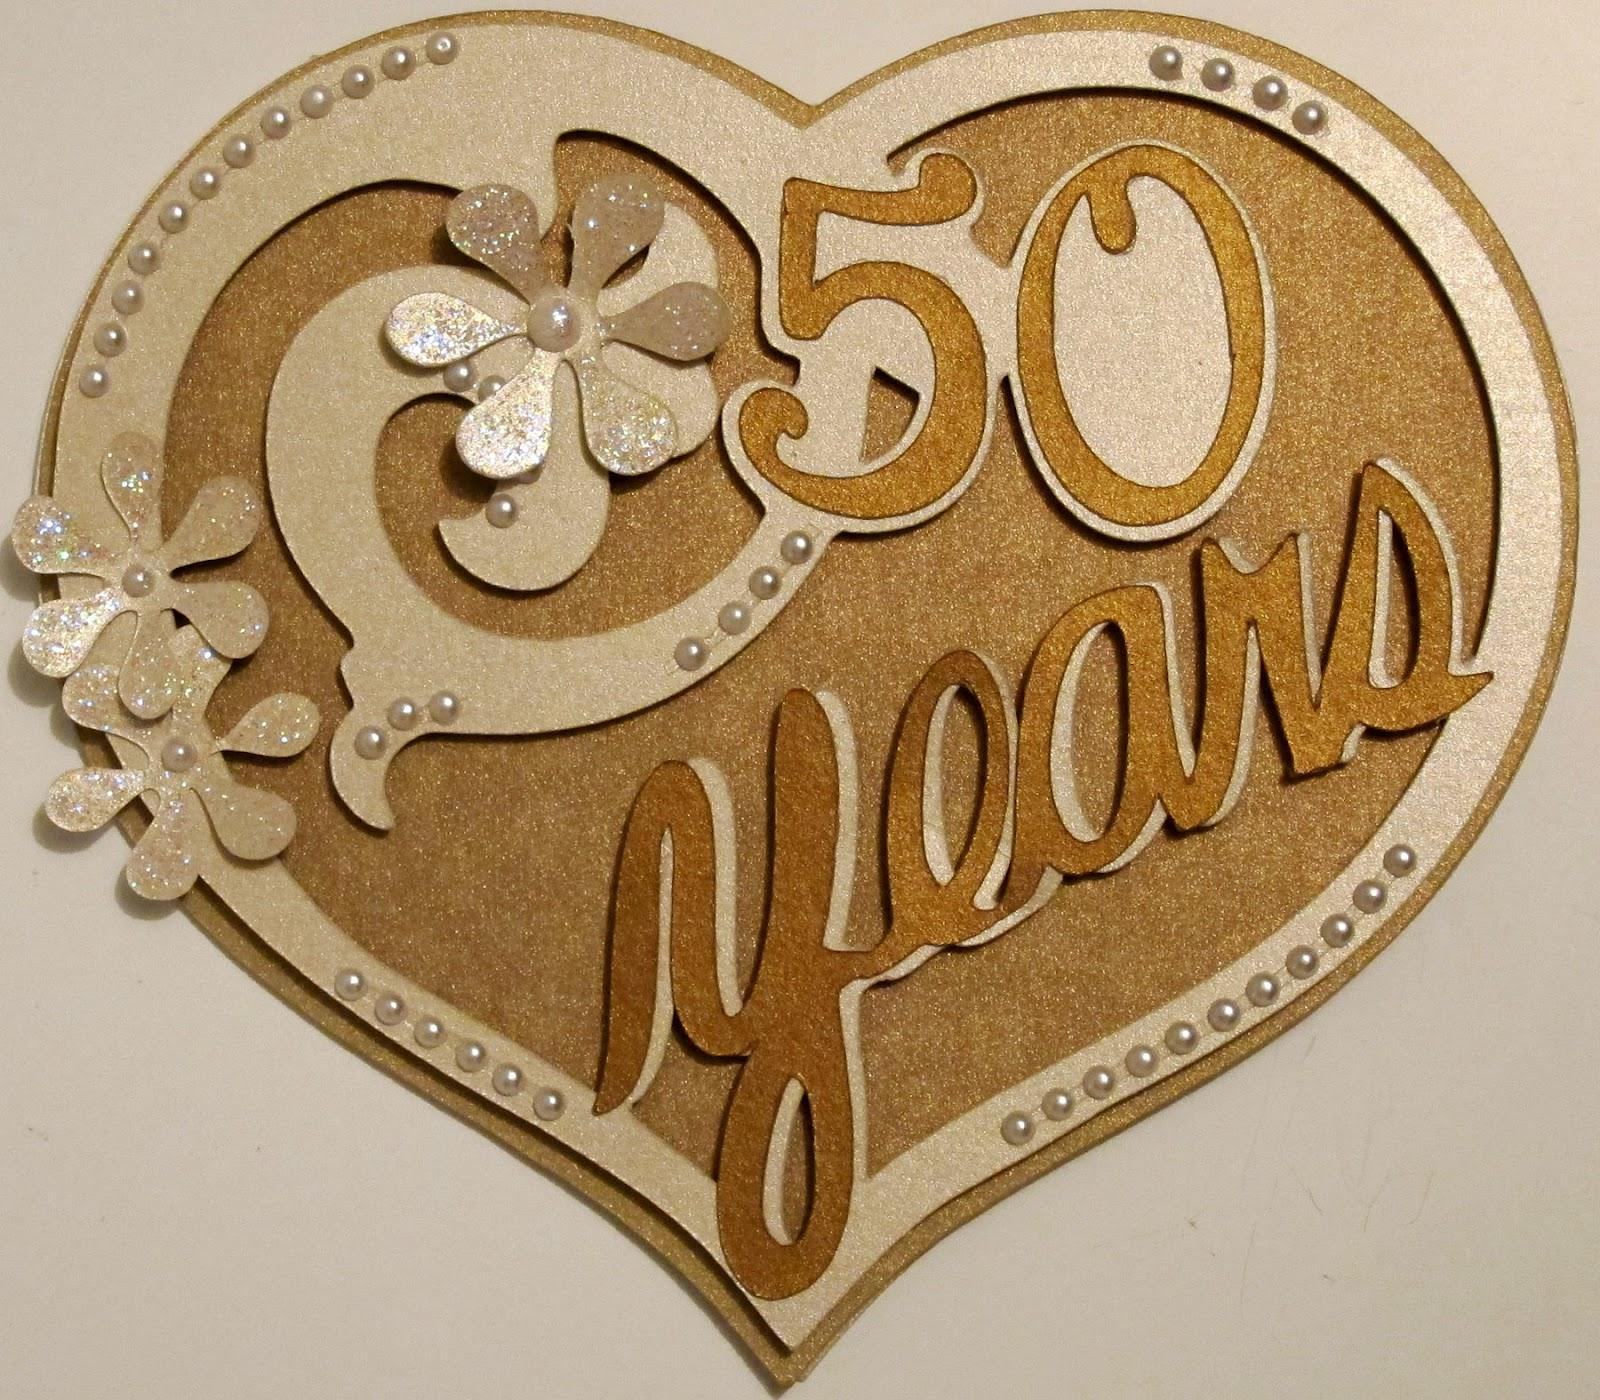 Golden wedding anniversary clipart joy studio design for What is 50th wedding anniversary